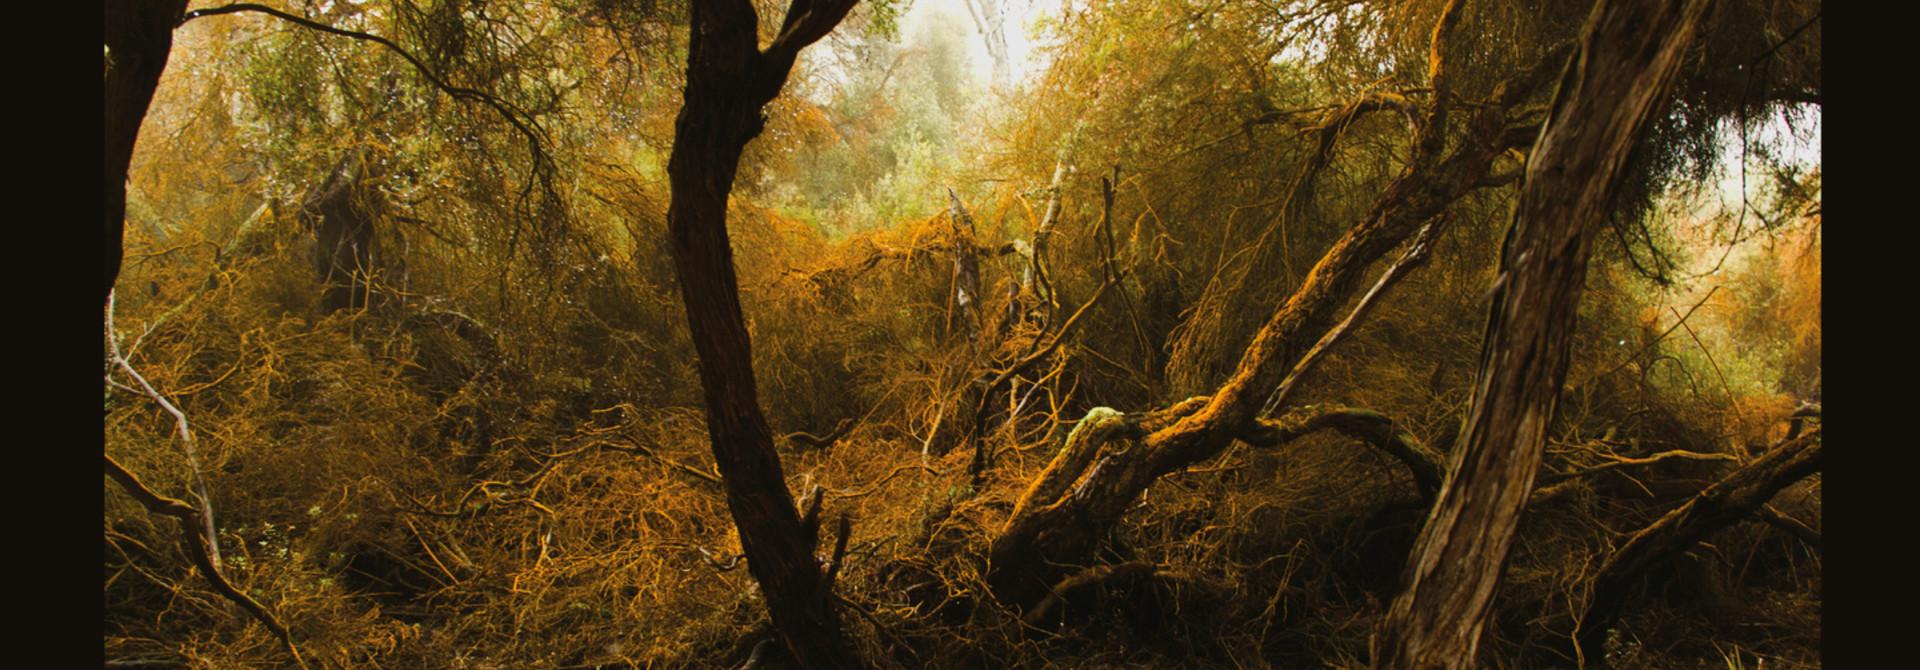 Lubomyr Melnyk • Fallen Trees